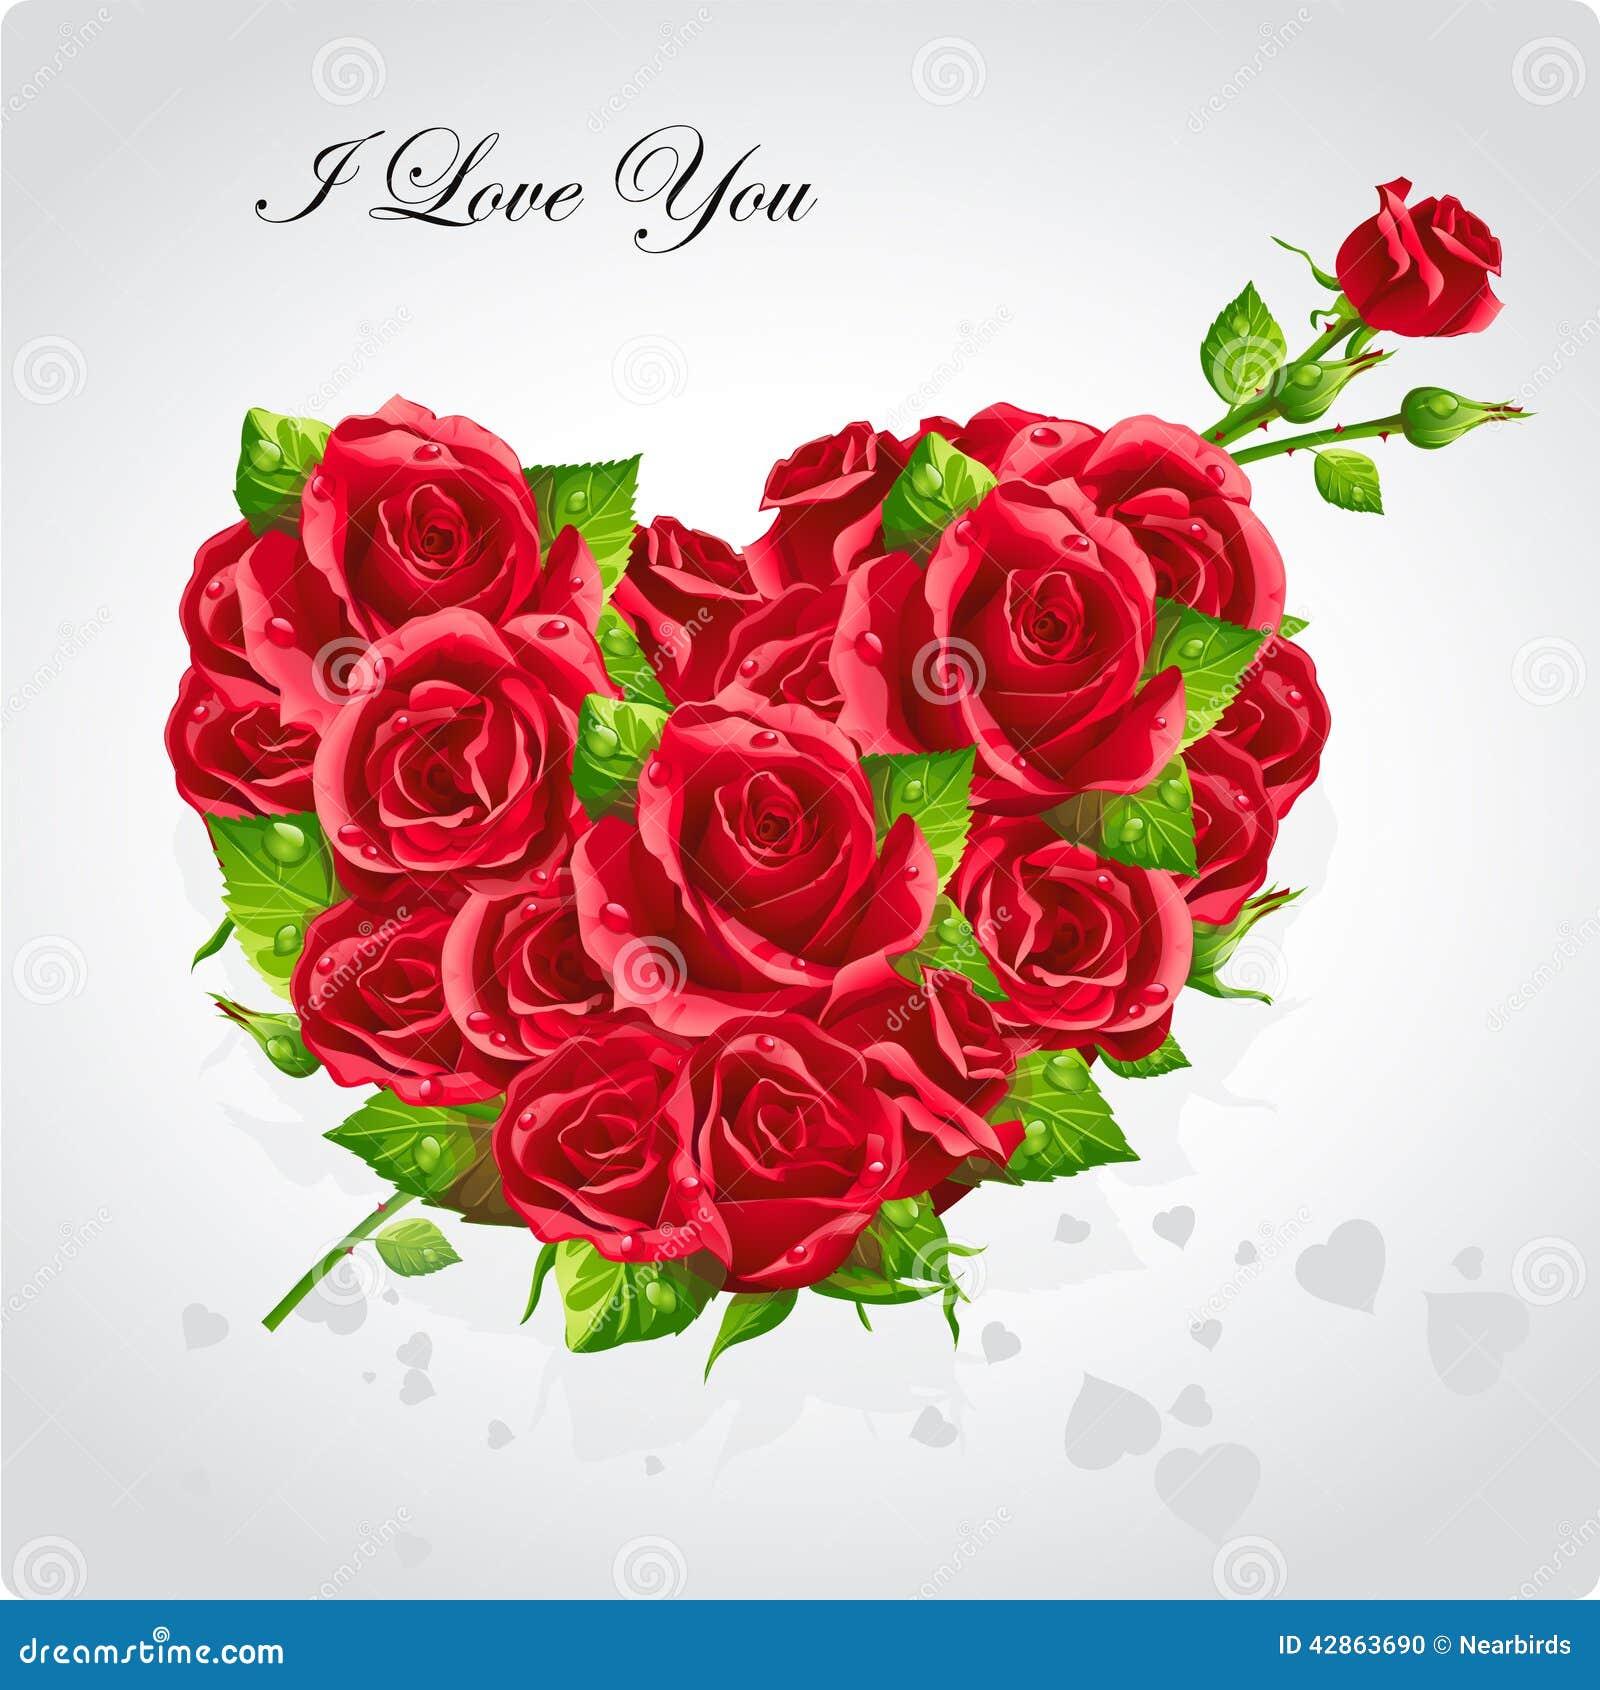 karte f r valentinstag herz roten roses eps10 vektor abbildung bild 42863690. Black Bedroom Furniture Sets. Home Design Ideas